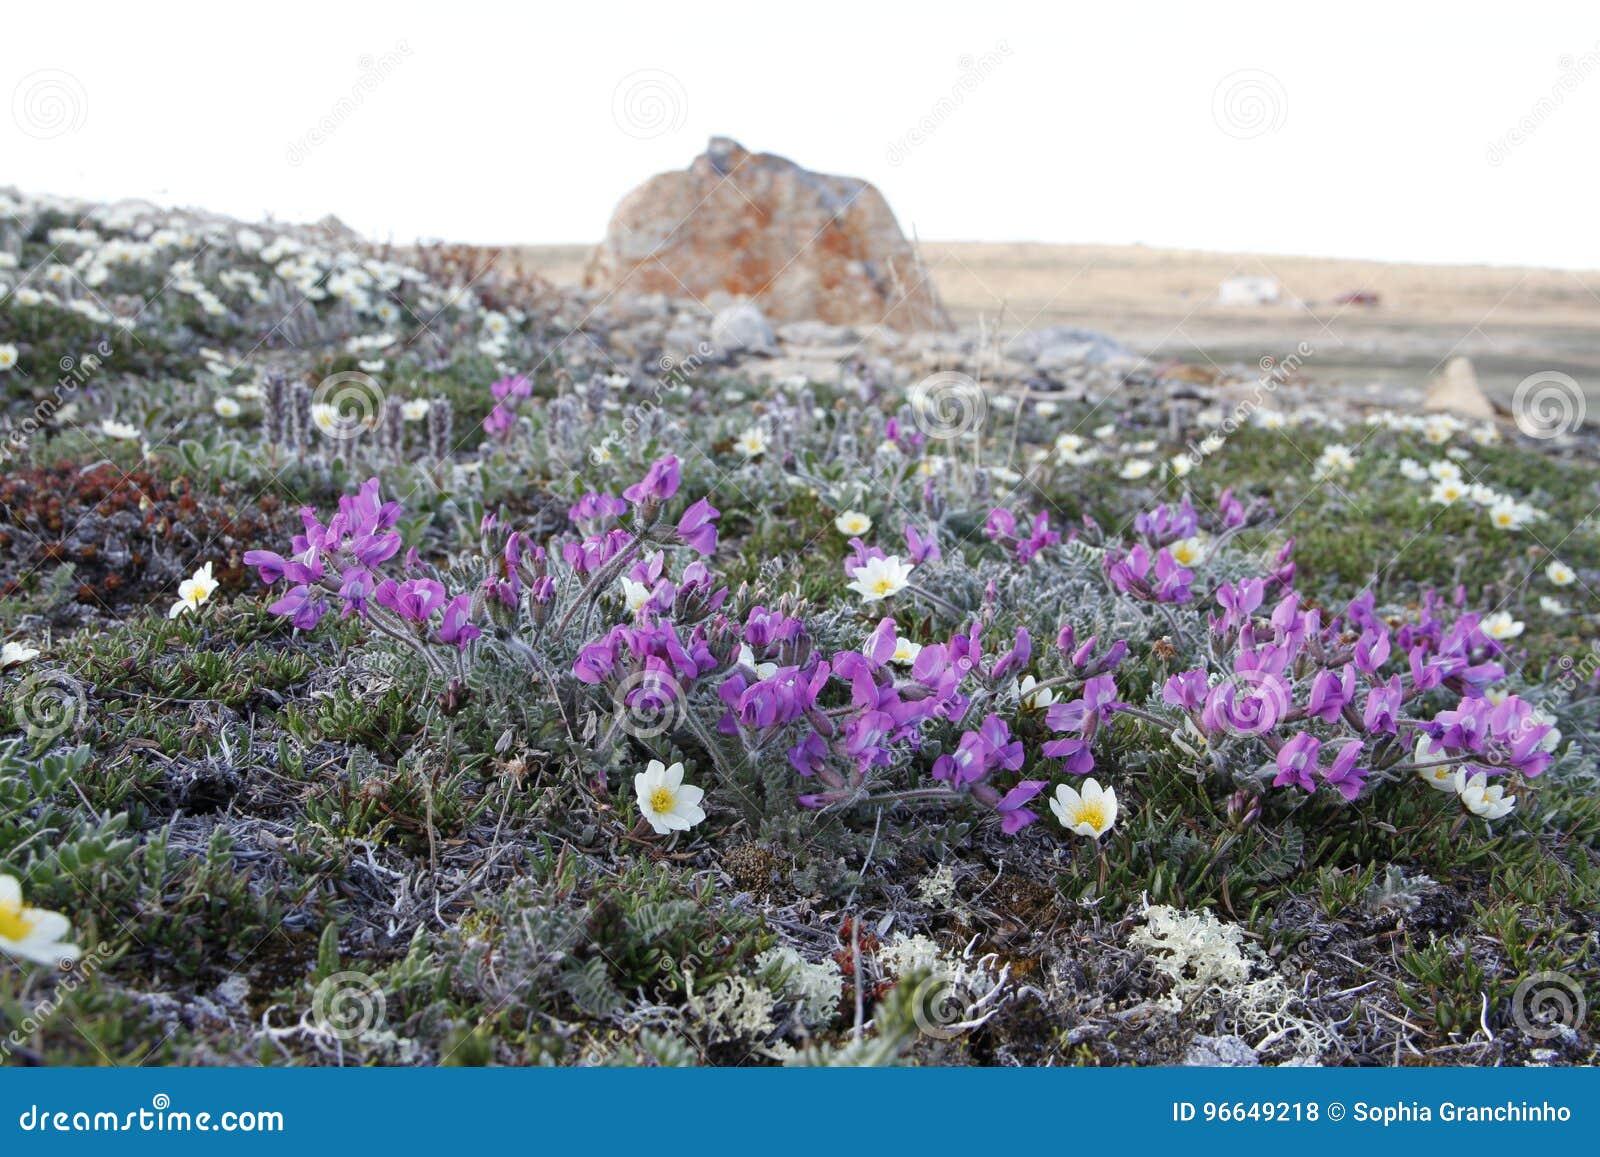 Arctic Oxytrope Oxytropis arctic in full bloom